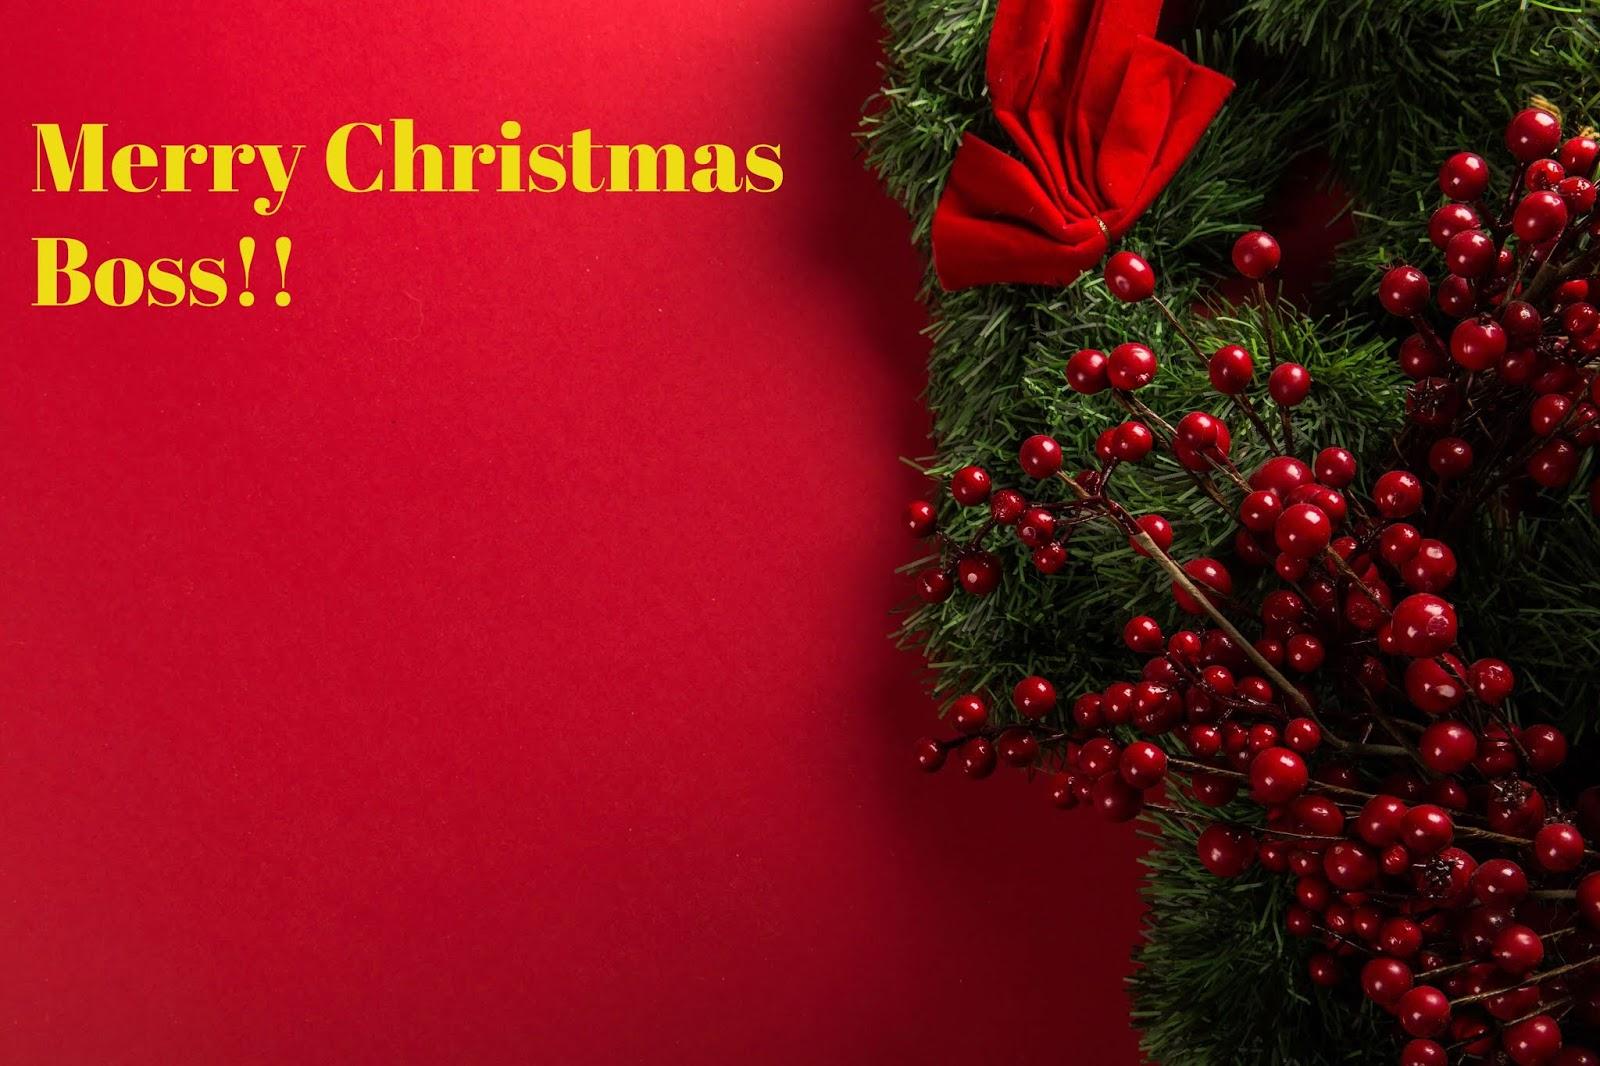 christmas greetings for boss - Best Christmas Greetings